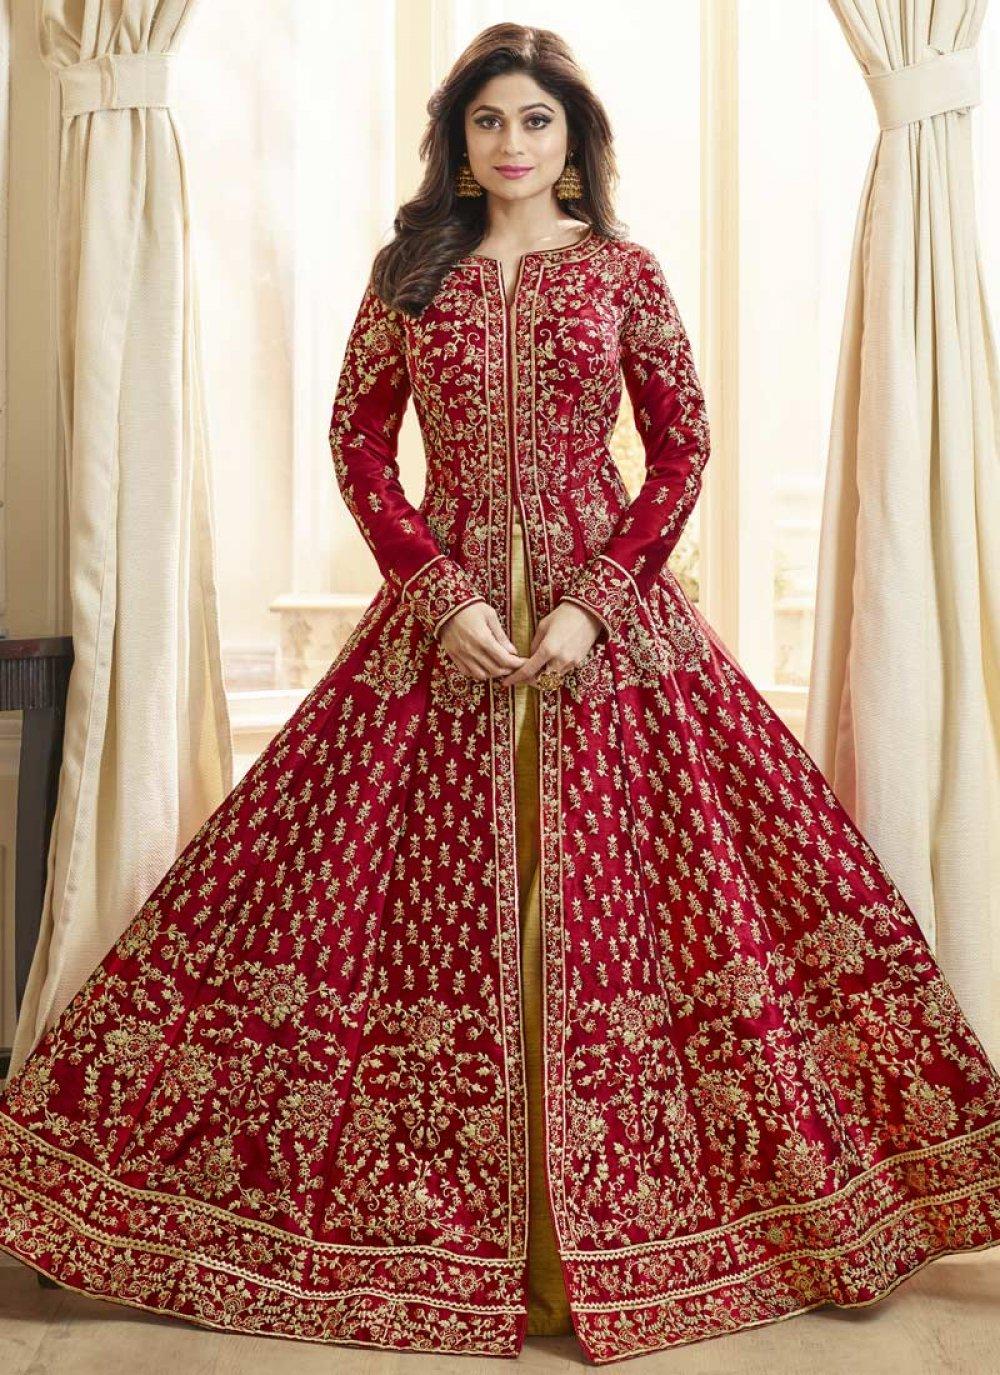 Shamita Shetty Simplistic Red Floor Length Anarkali Suit